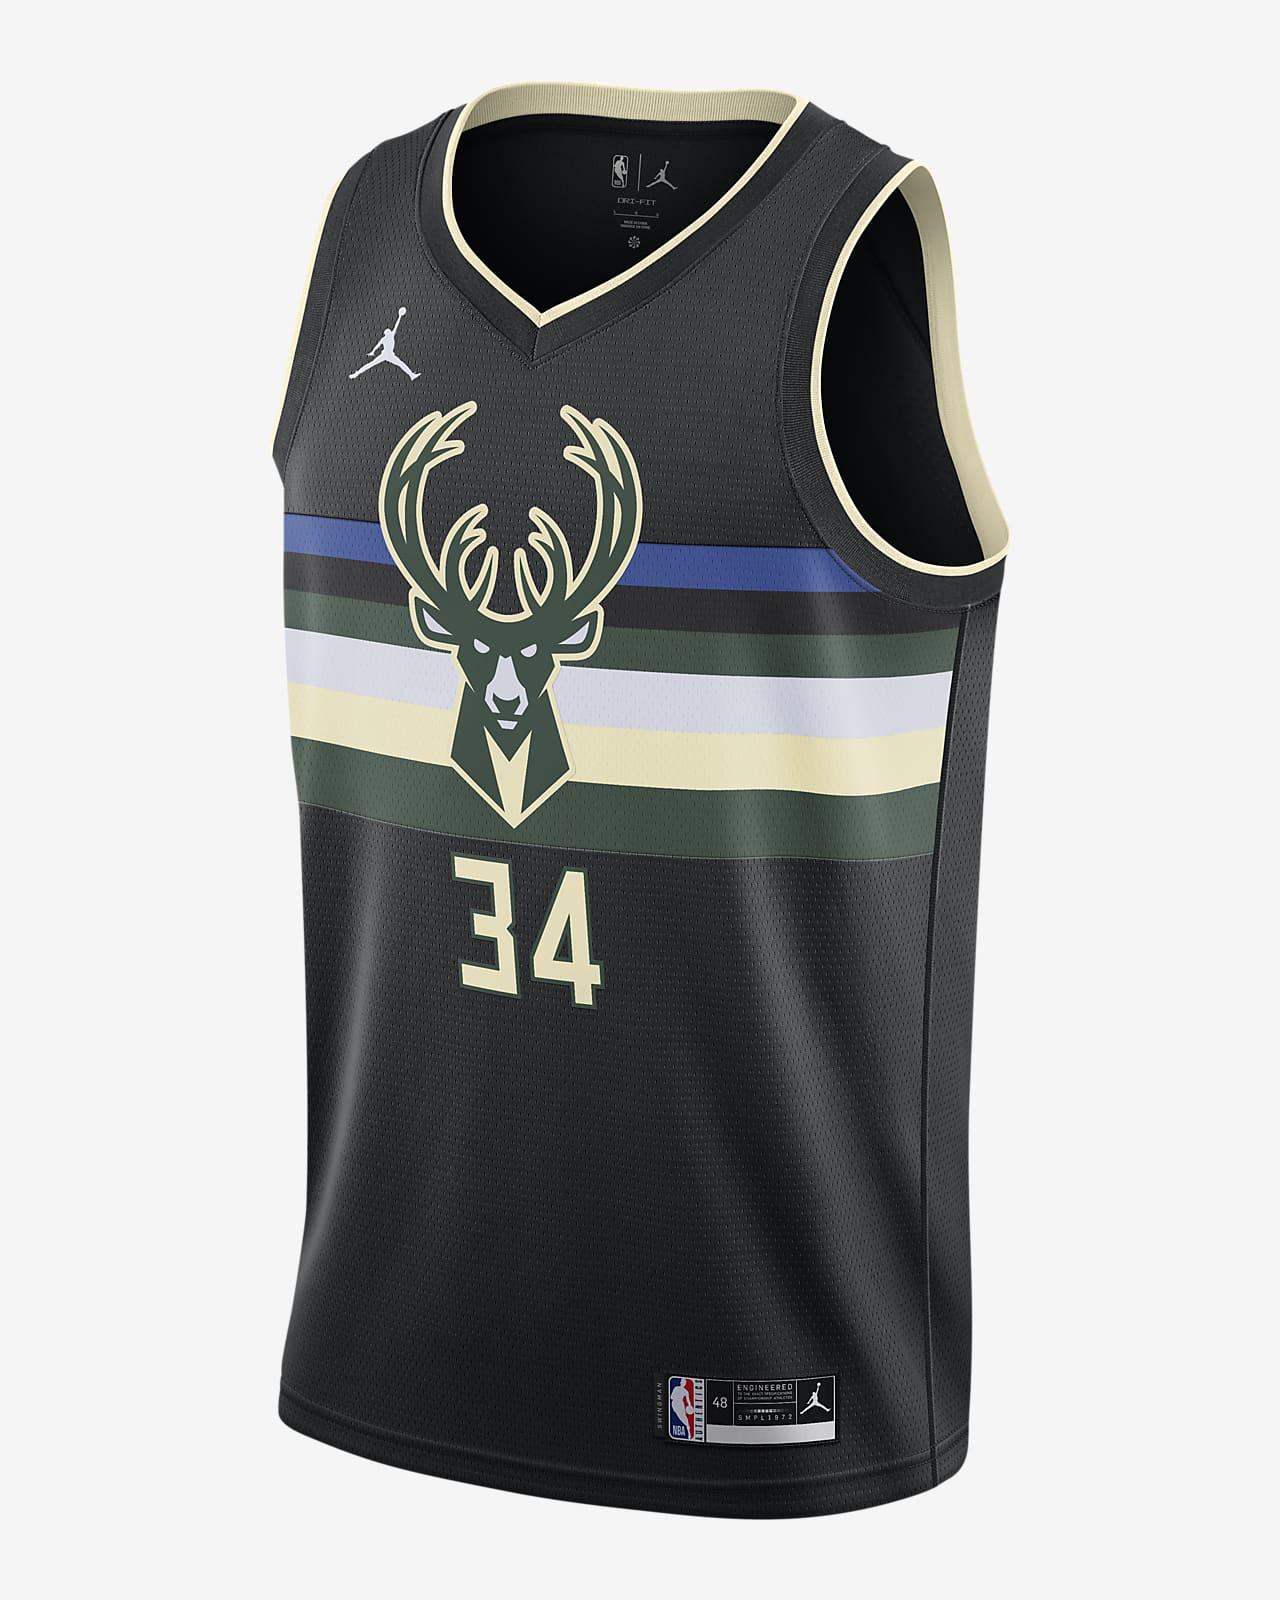 Maillot Jordan NBA Swingman Giannis Antetokounmpo Bucks Statement Edition 2020